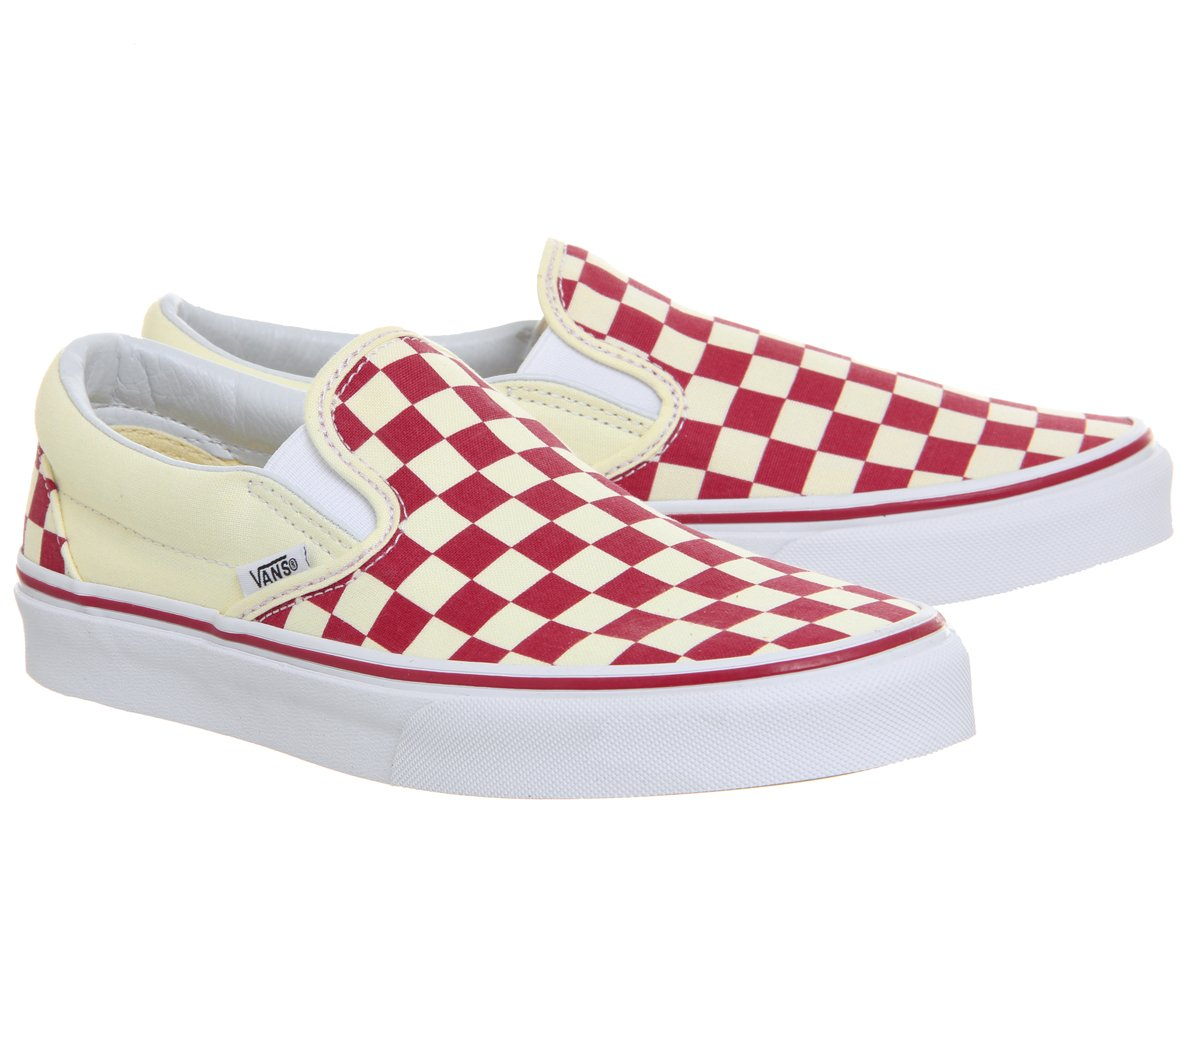 Vans Unisex Classic (Checkerboard) Slip-On Skate Shoe B07B4RTVYL 5 M US Women / 3.5 M US Men (Checker) Racing Red / White